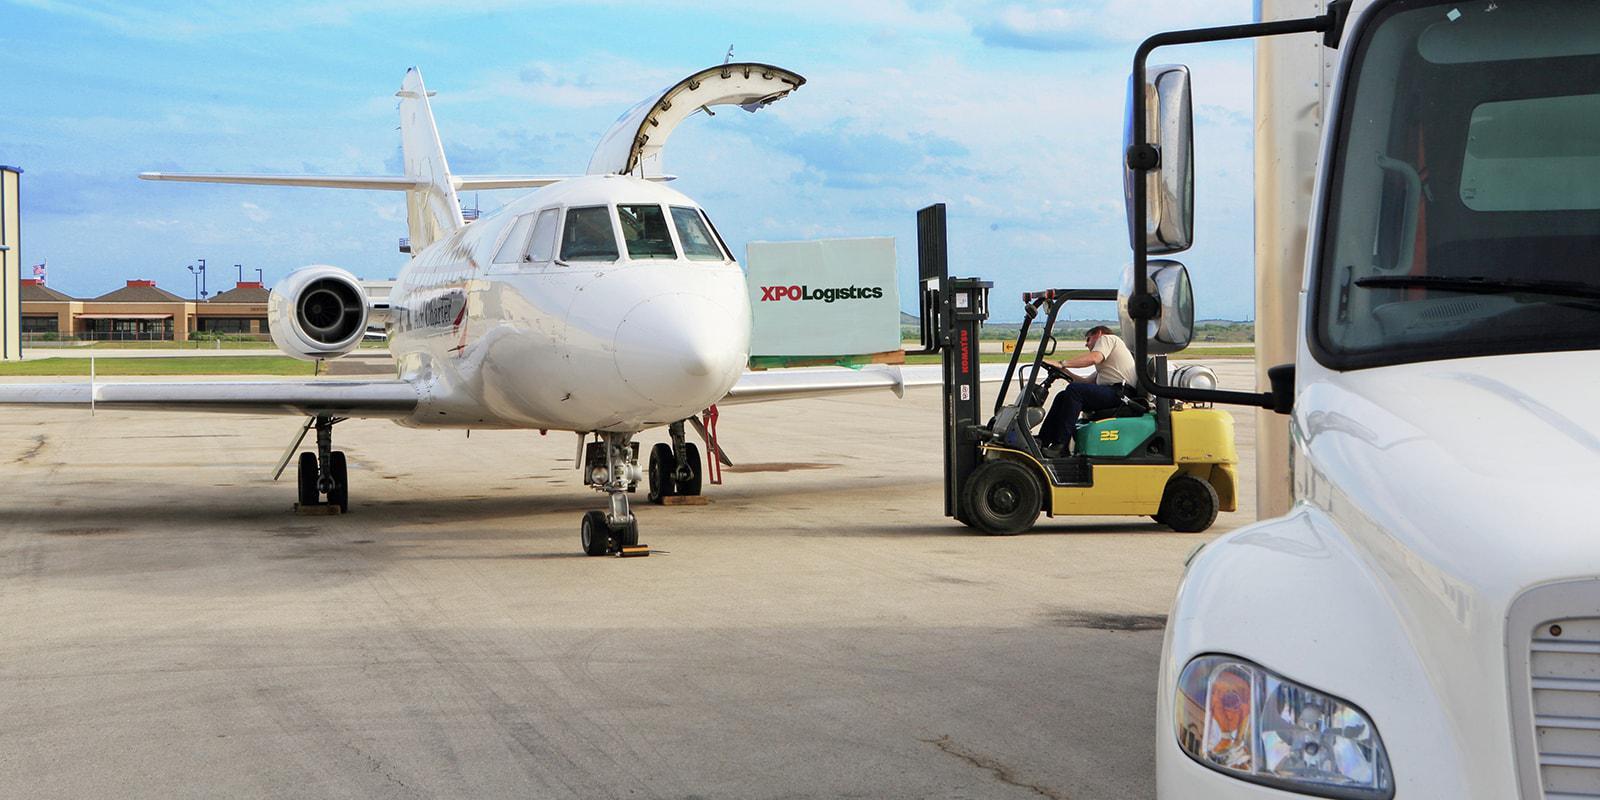 cargo loaded onto charter plane